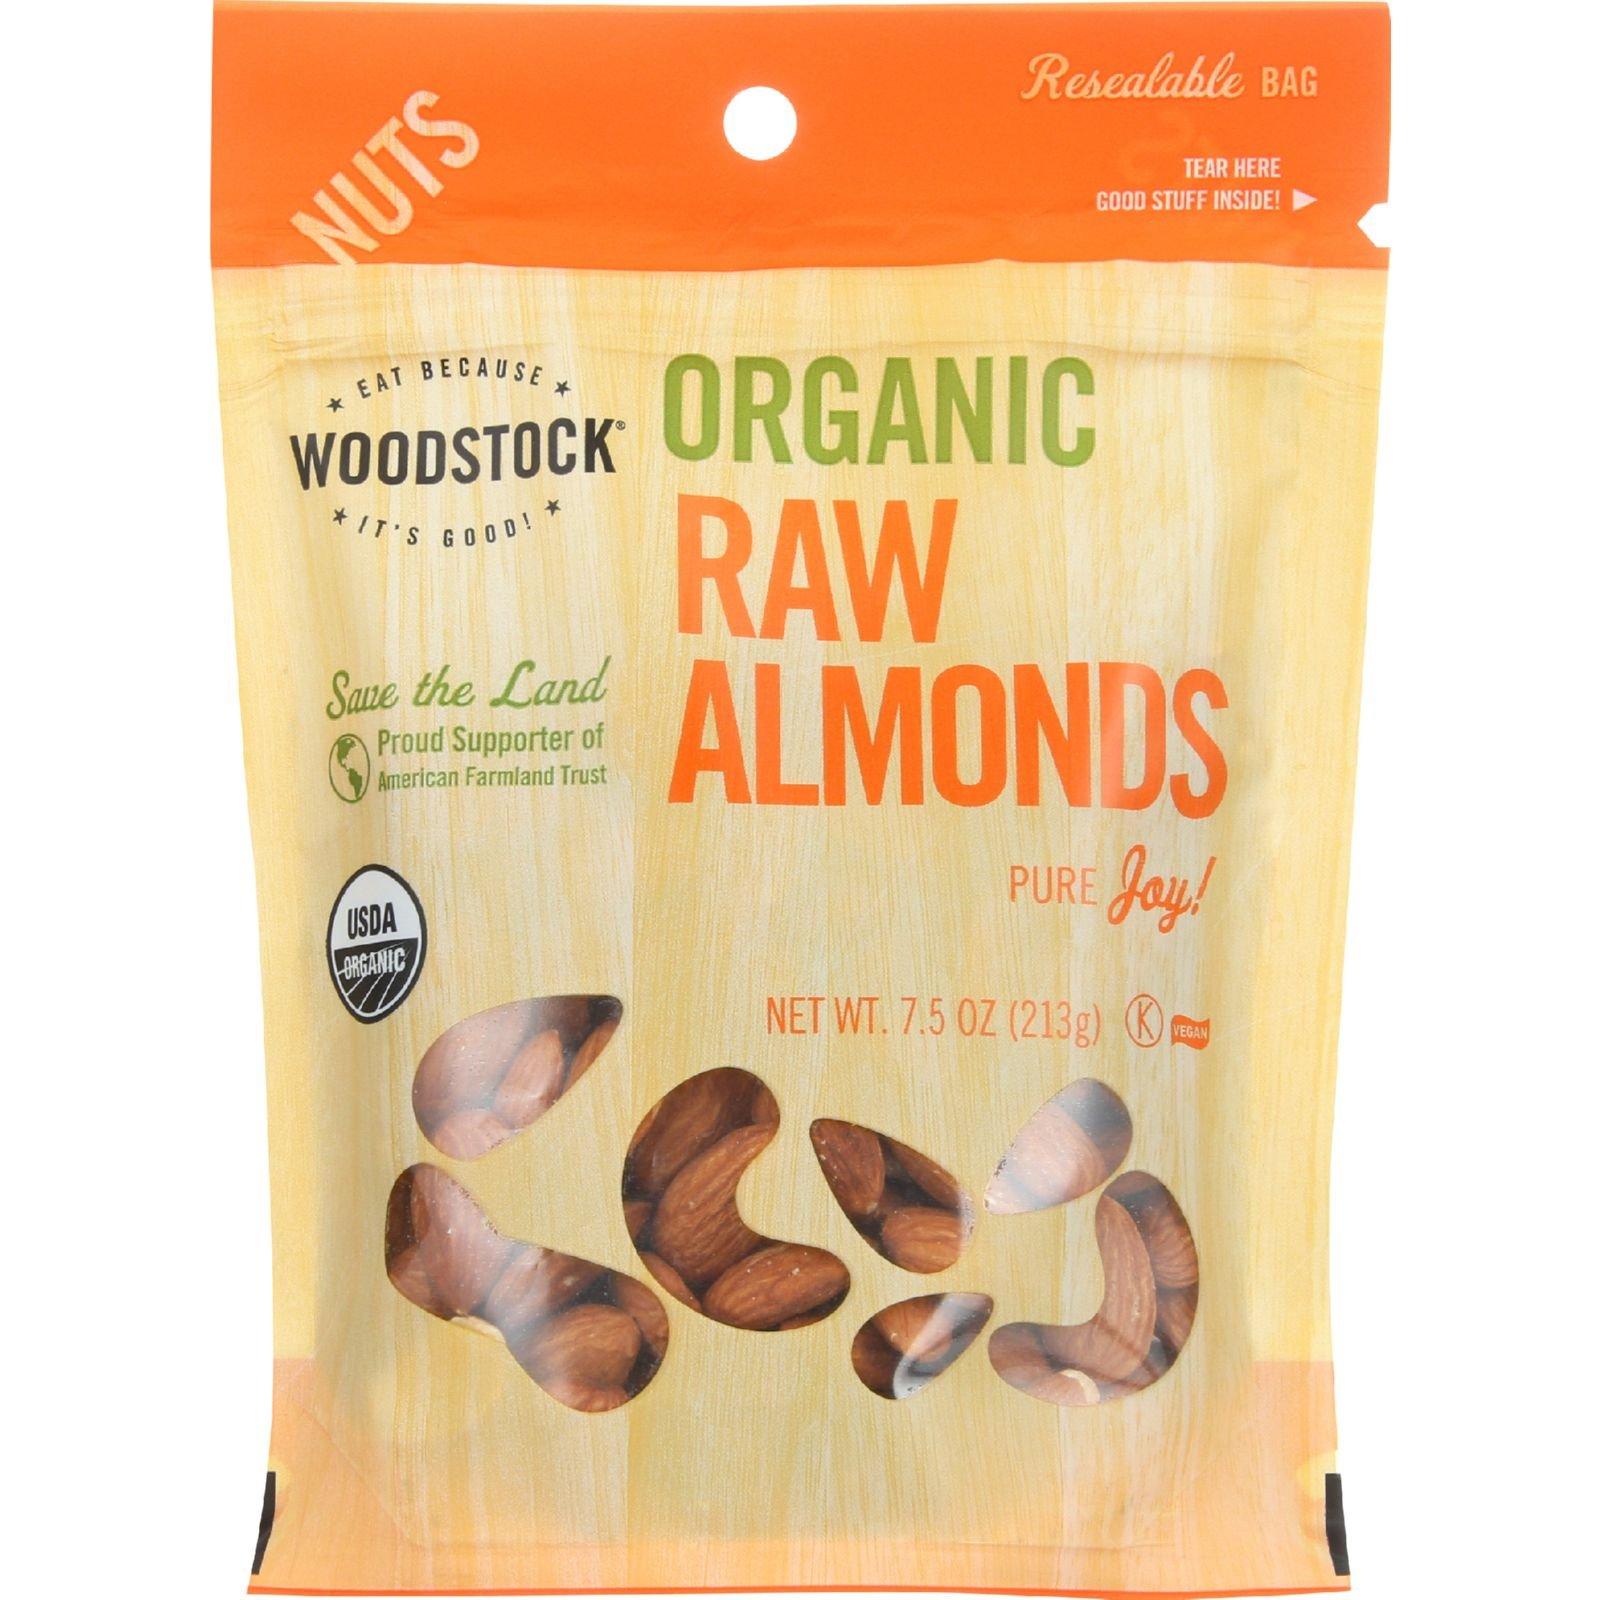 Woodstock Nuts - Organic - Almonds - Raw - 7.5 oz - case of 8 - 95%+ Organic - Vegan